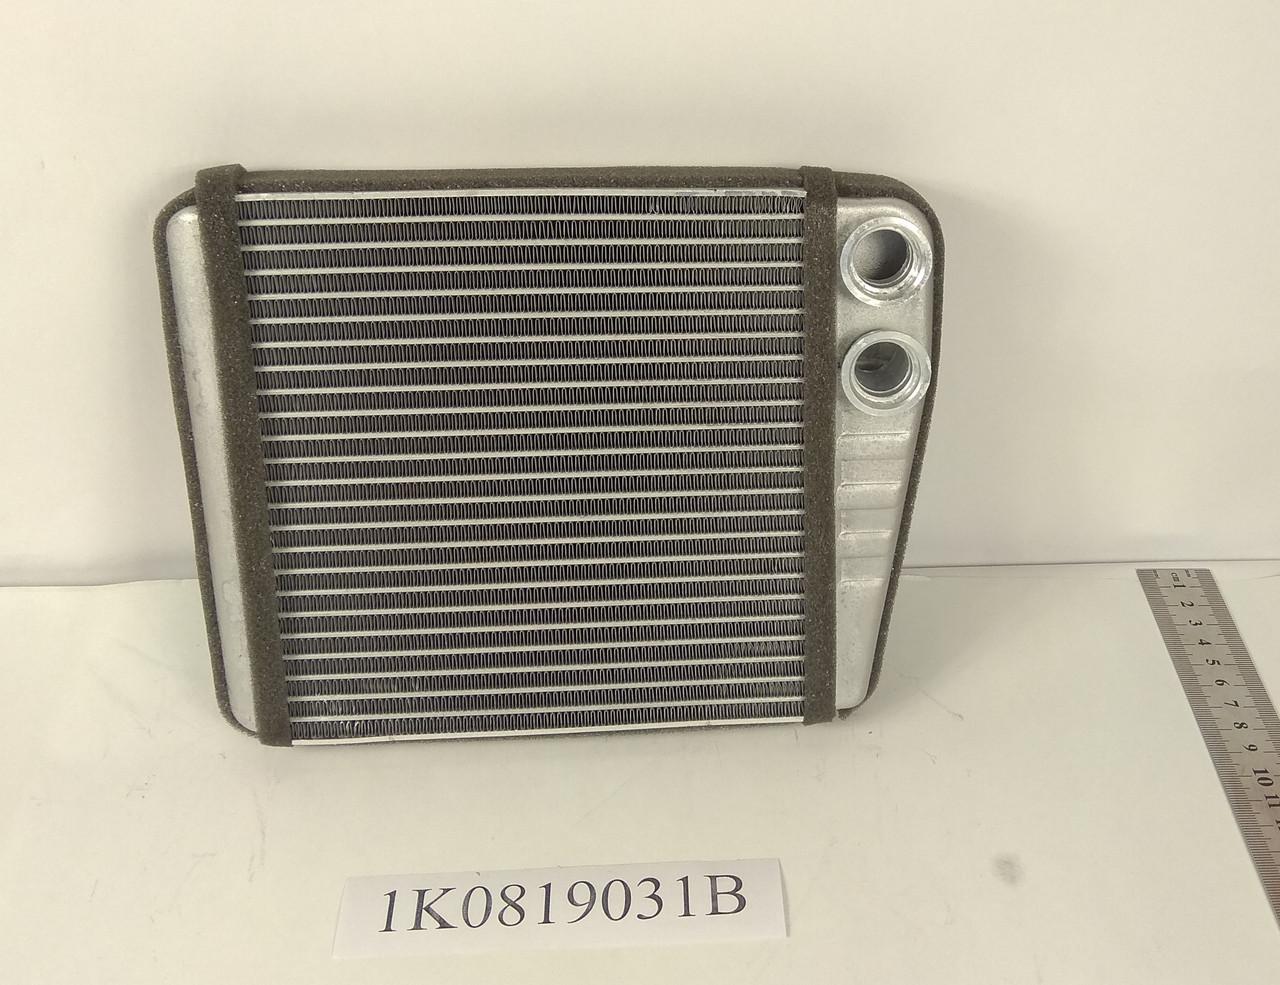 Радиатор печки Volkswagen Caddy 3 2004- (180*187мм по сотах) KEMP